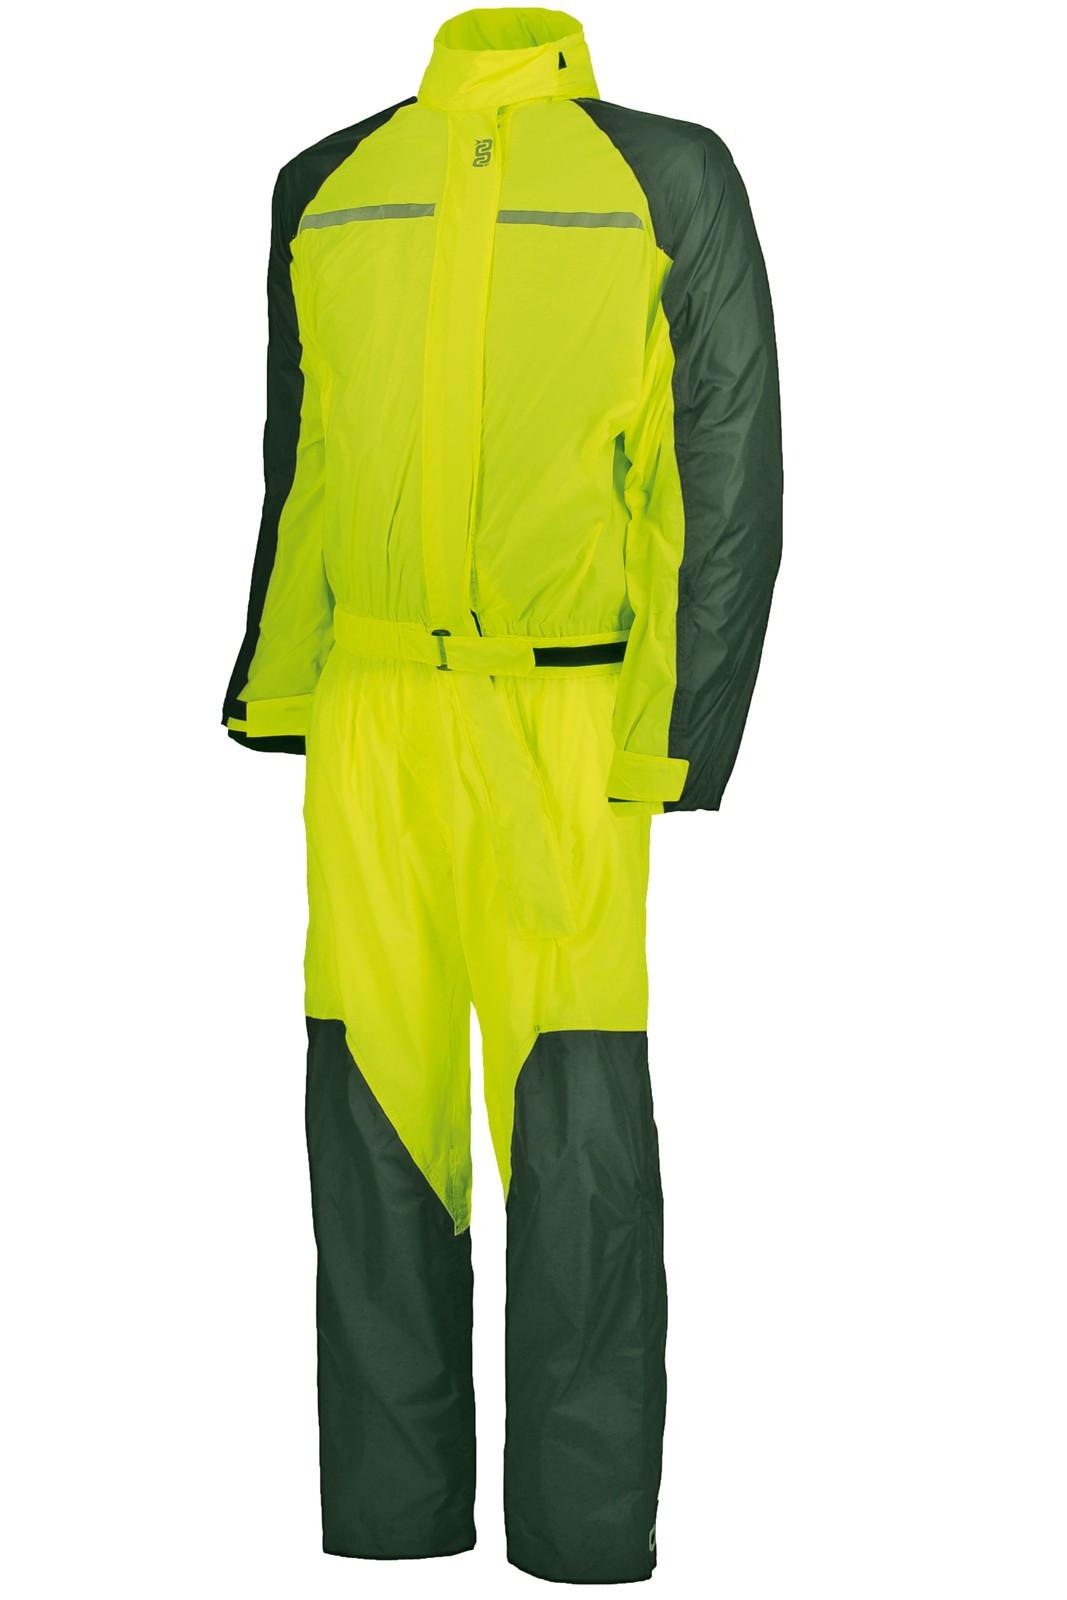 OJ Compact Total Fluo waterproof one piece suit